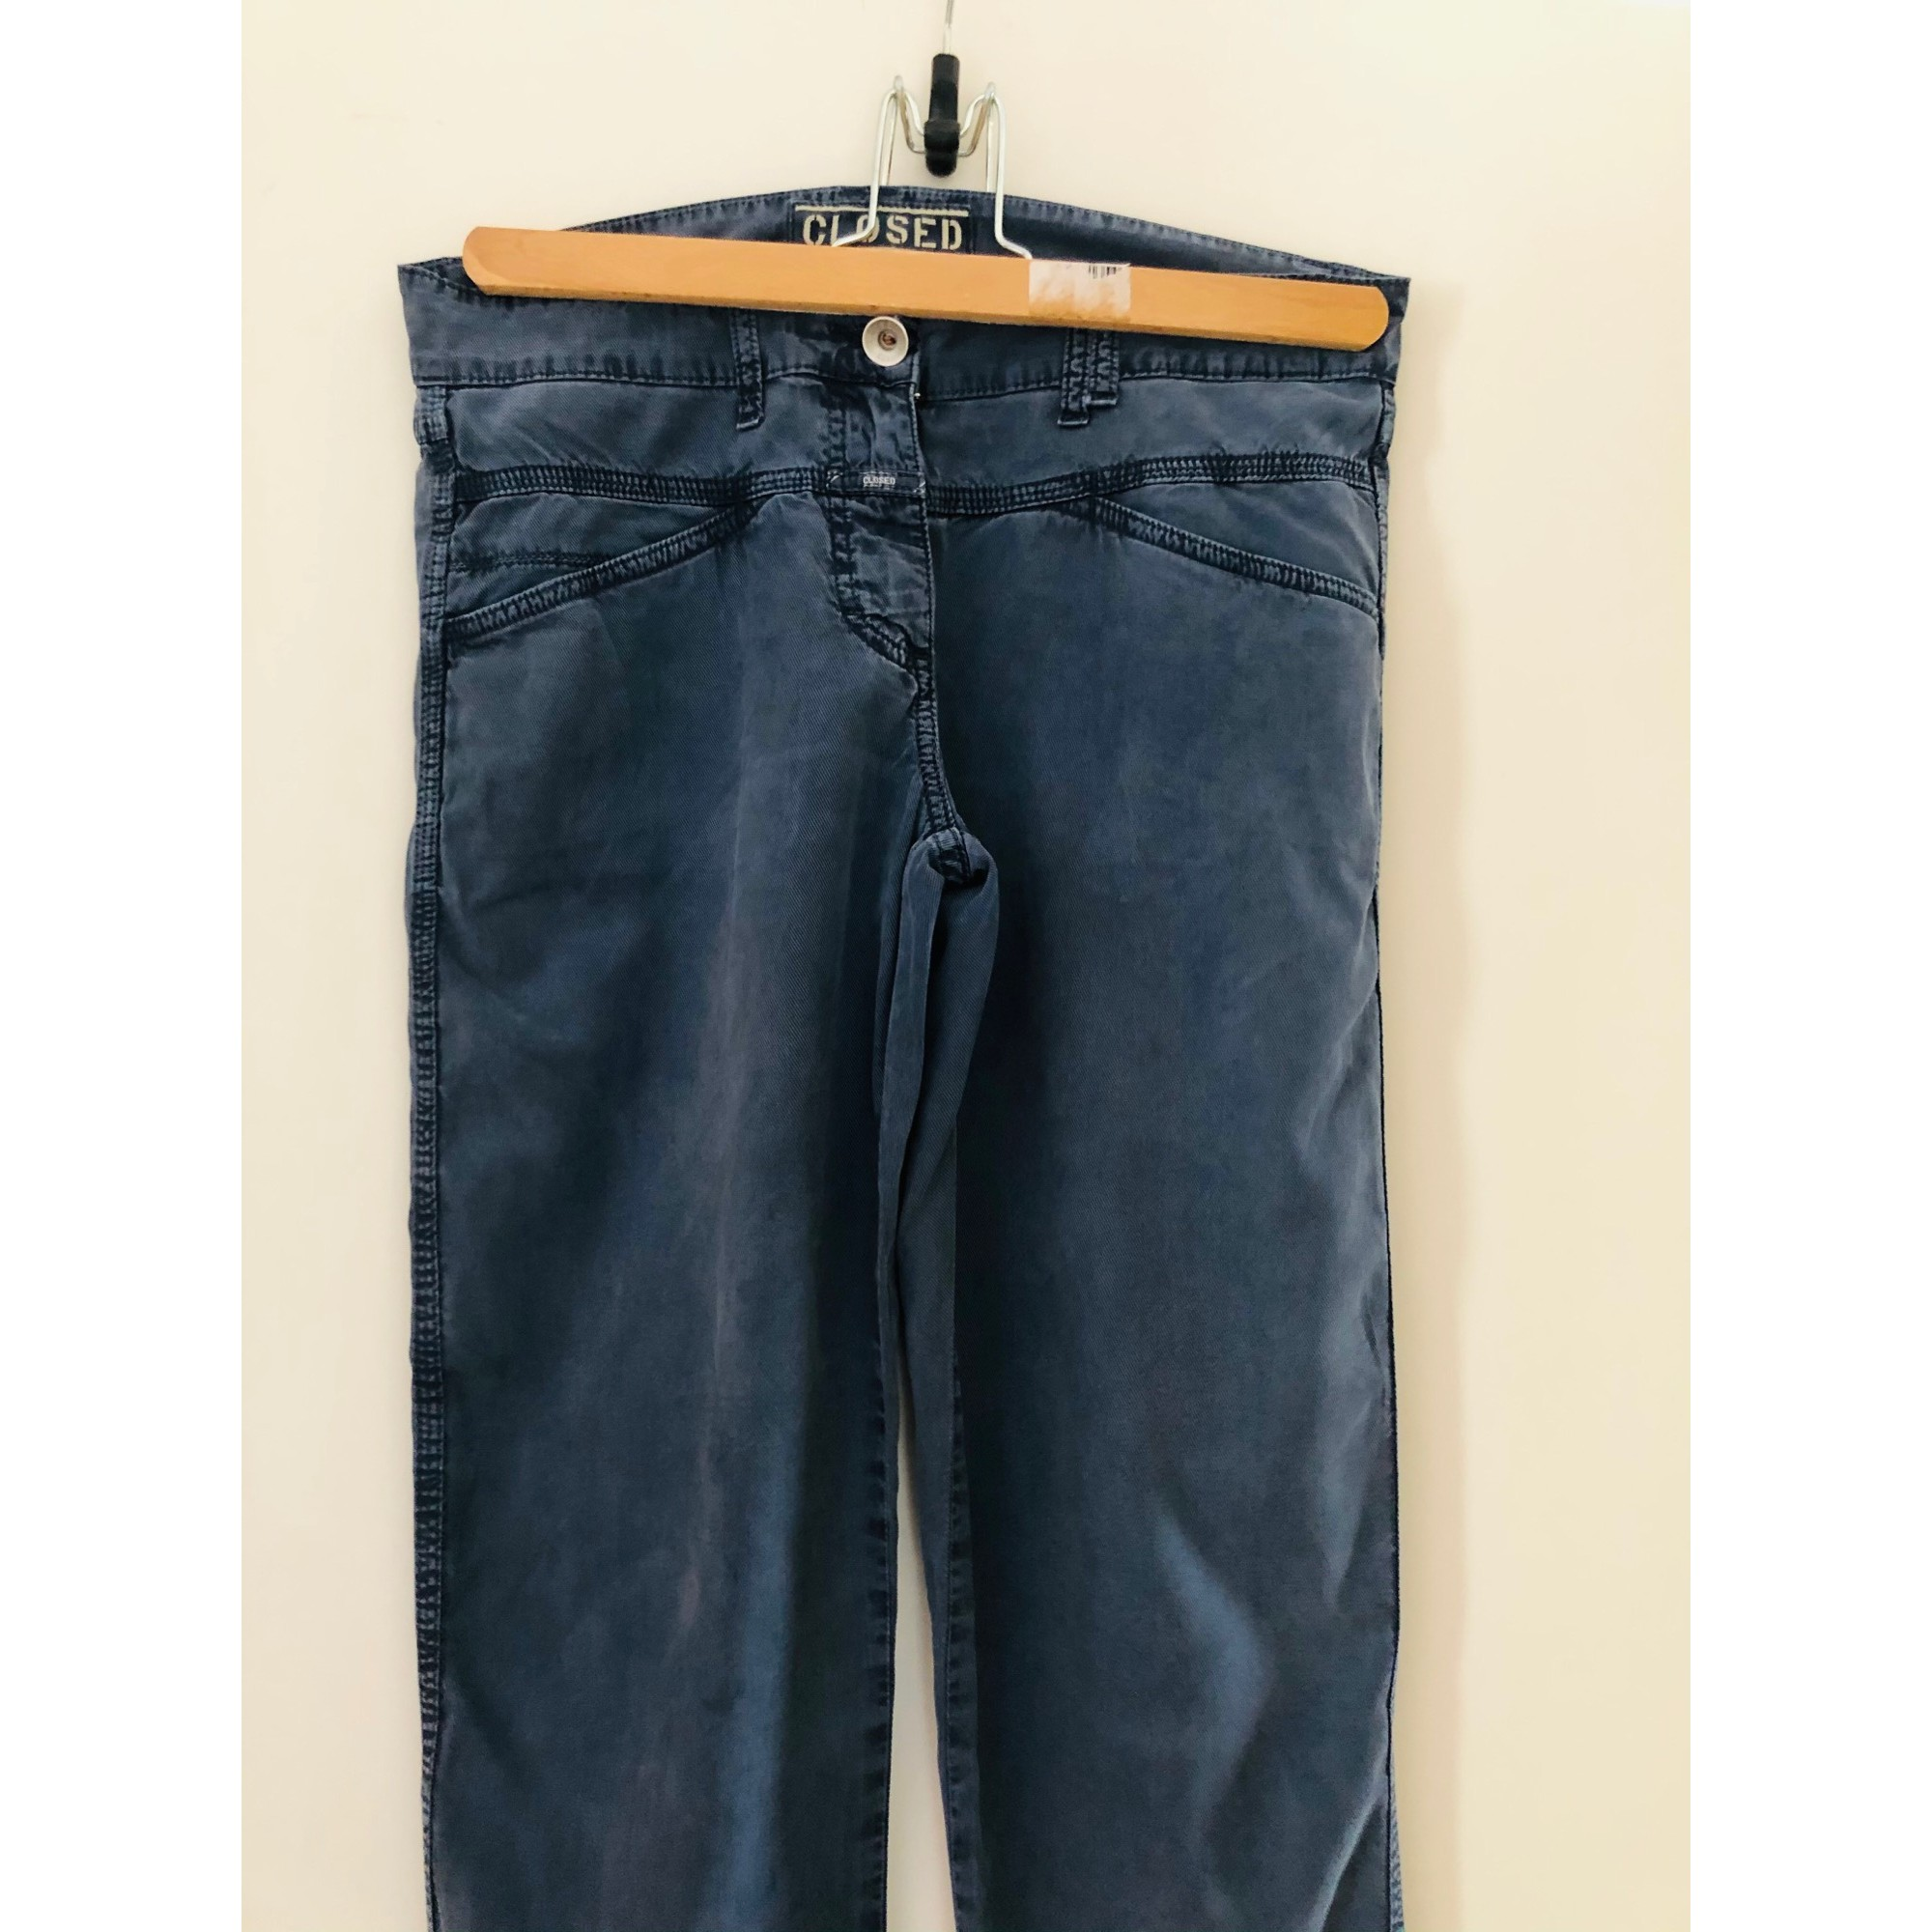 Jeans droit CLOSED Bleu, bleu marine, bleu turquoise